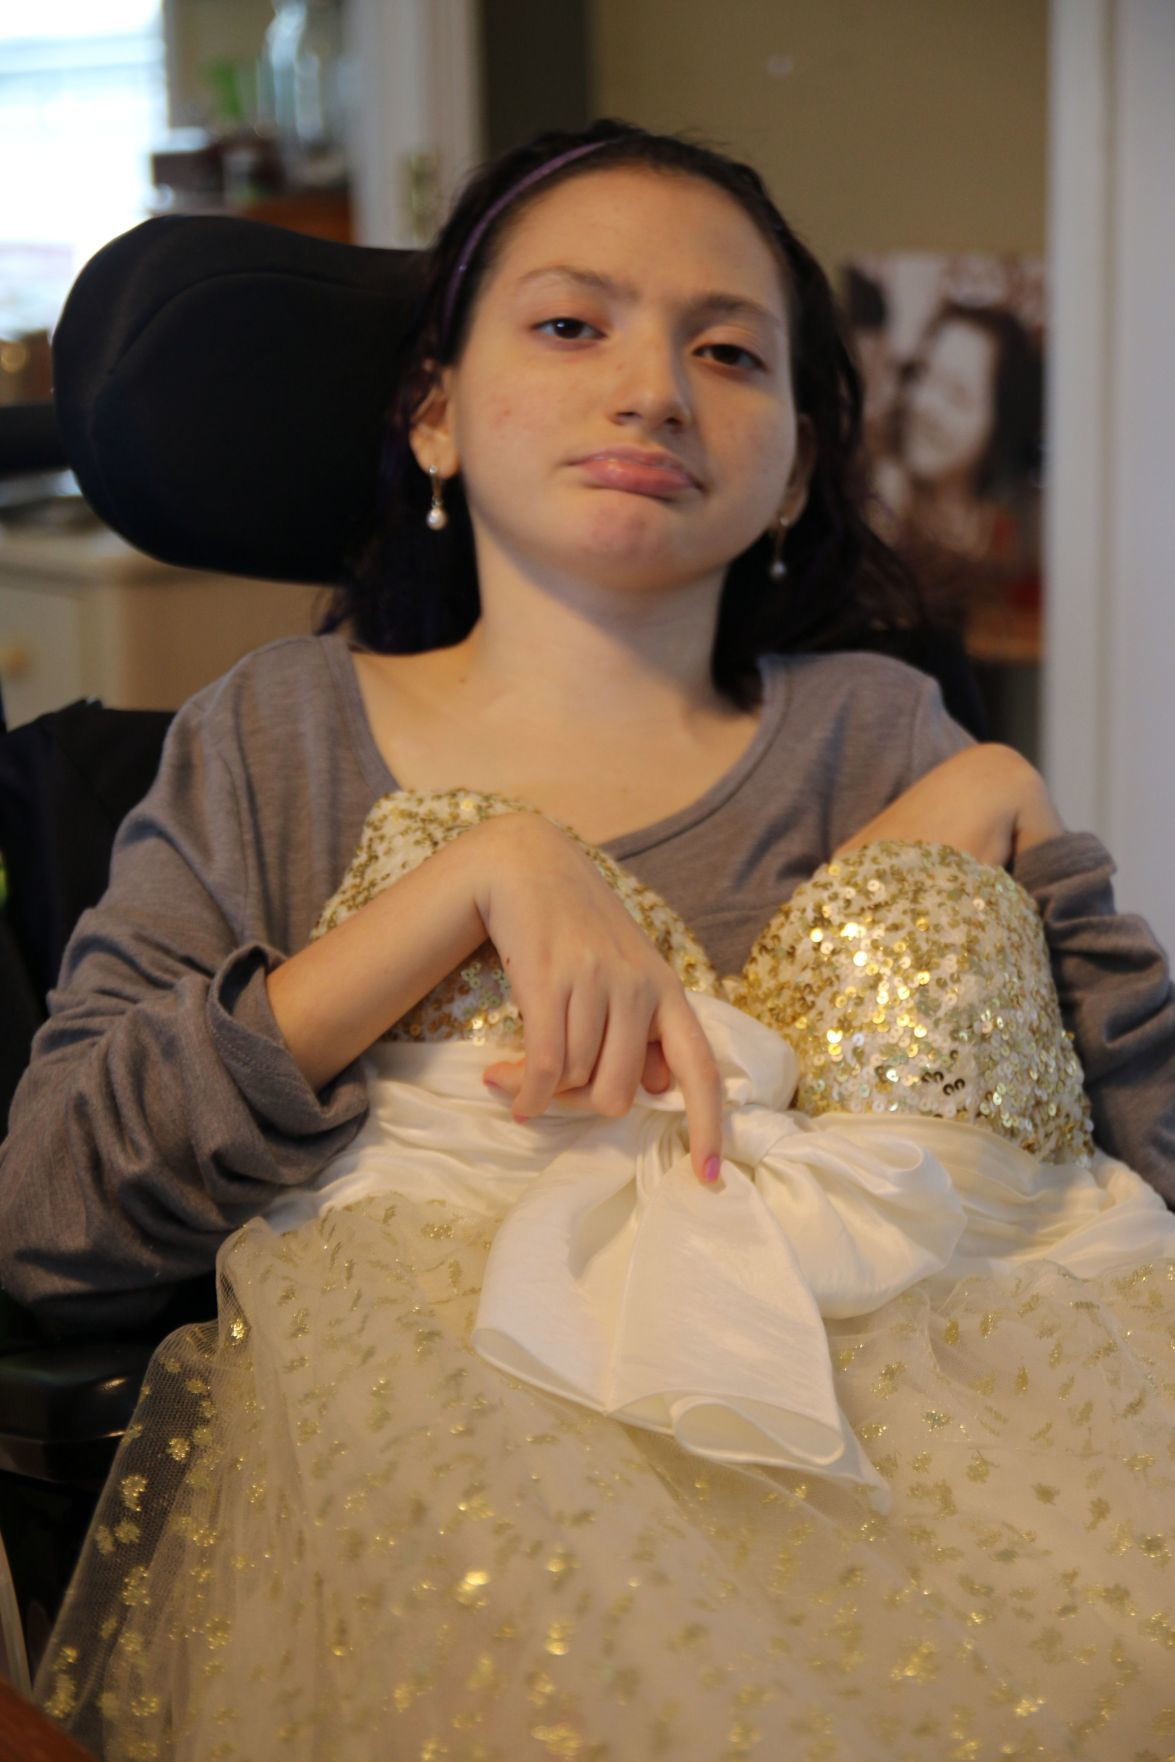 A princess and her dress